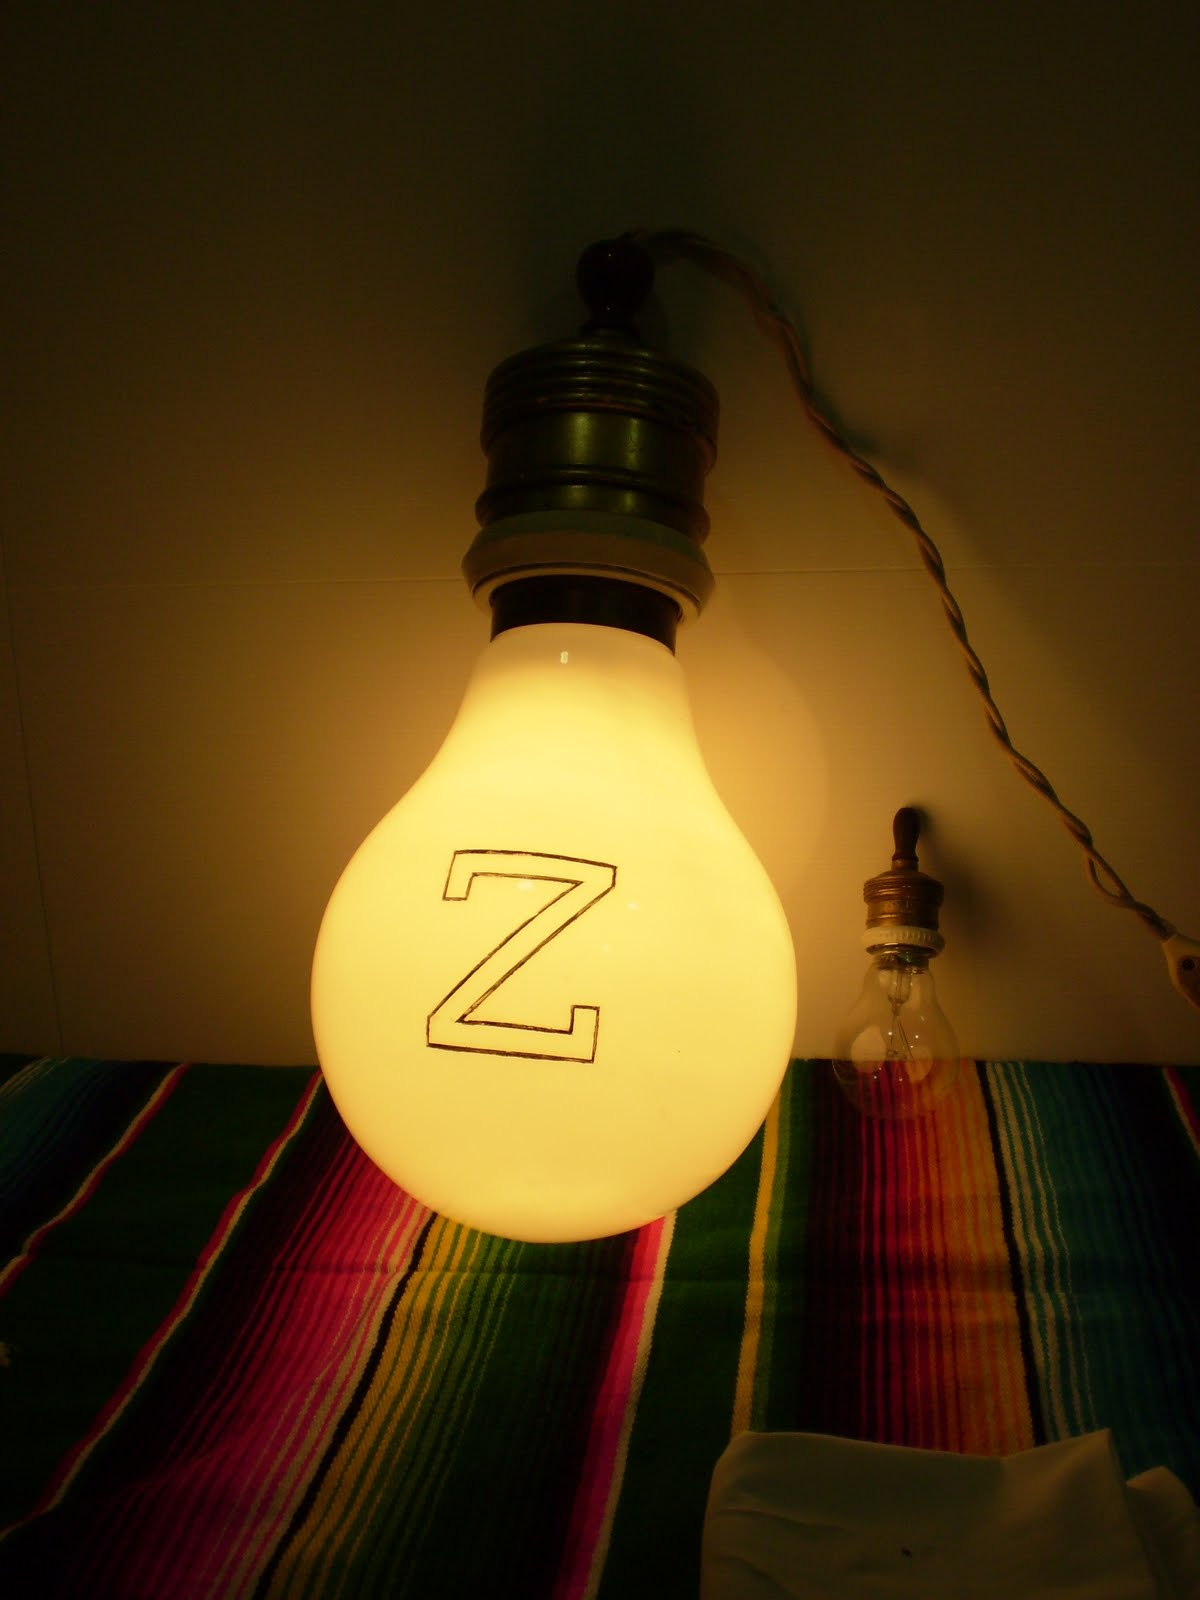 Vintager a antigua l mpara bombilla gigante promocional de l mparas z old giant light bulb lamp - Lamparas bombilla gigante ...